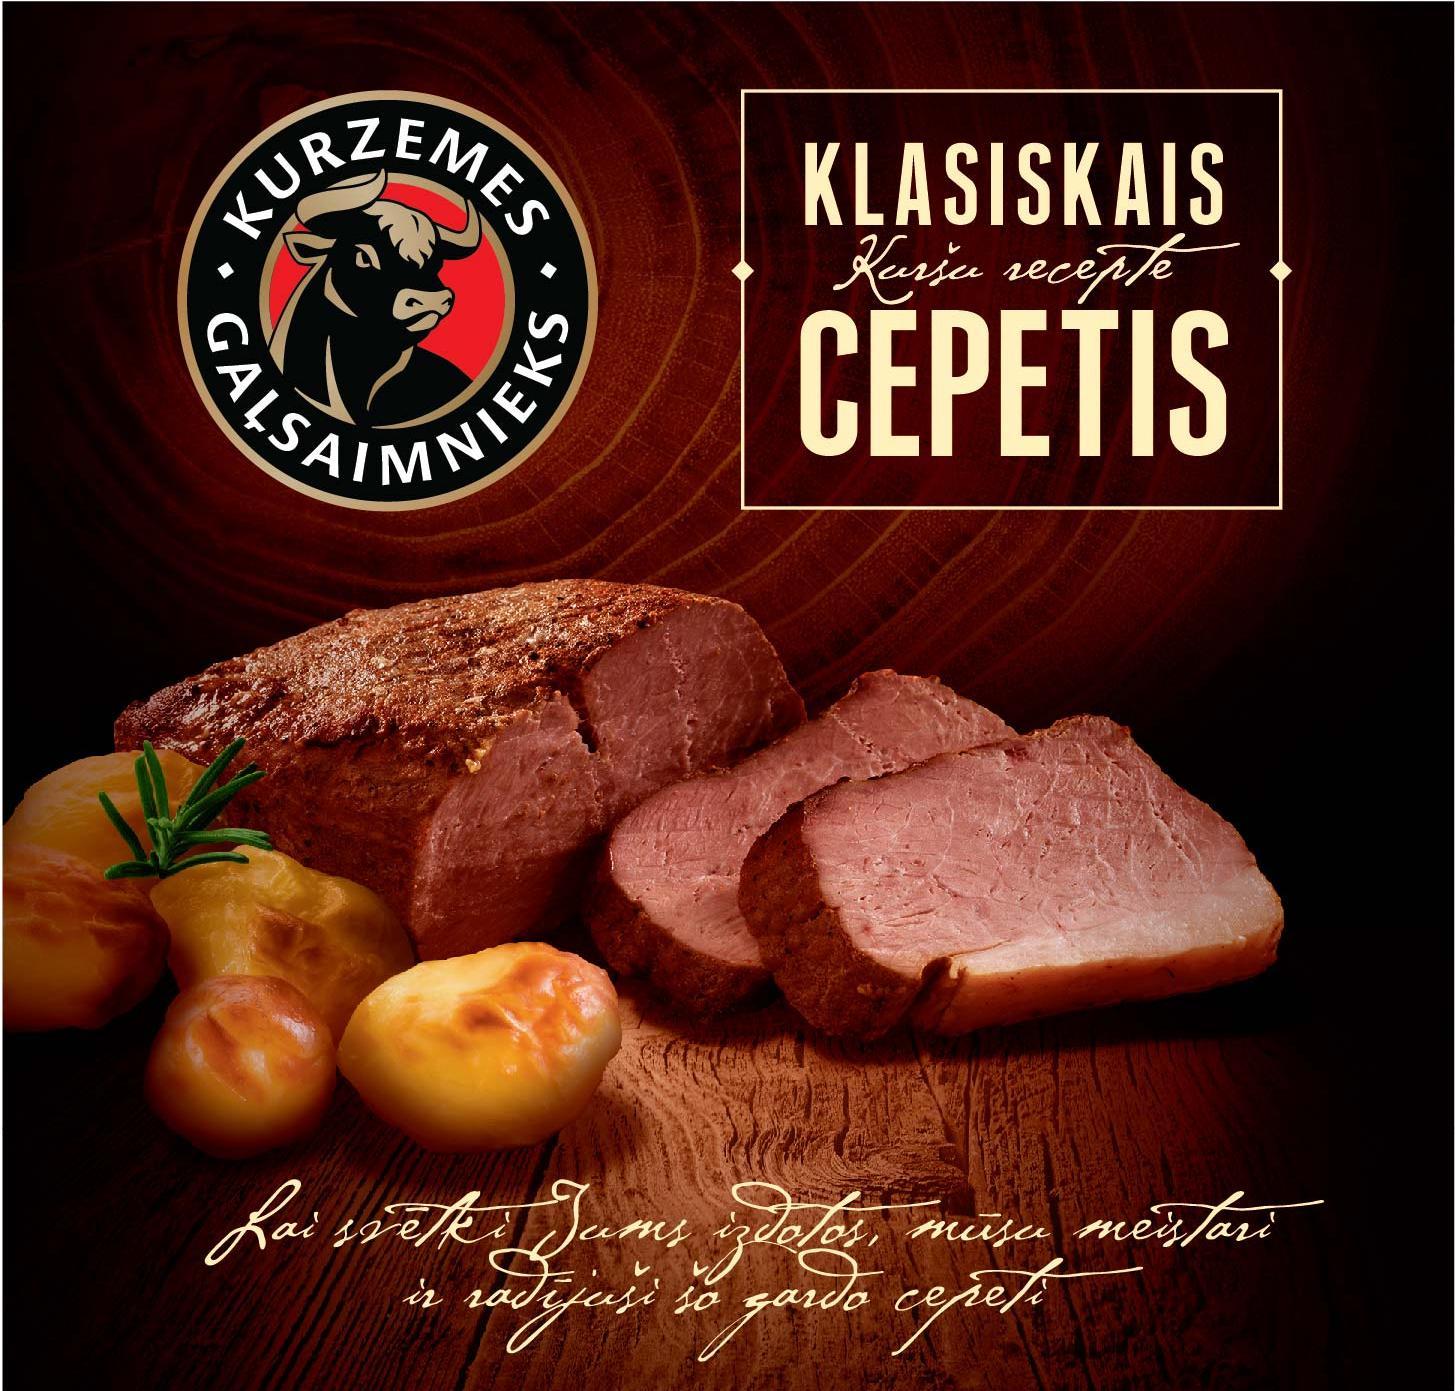 "Kurzemes Gaļsaimnieks cepetis ""Klasiskais"""